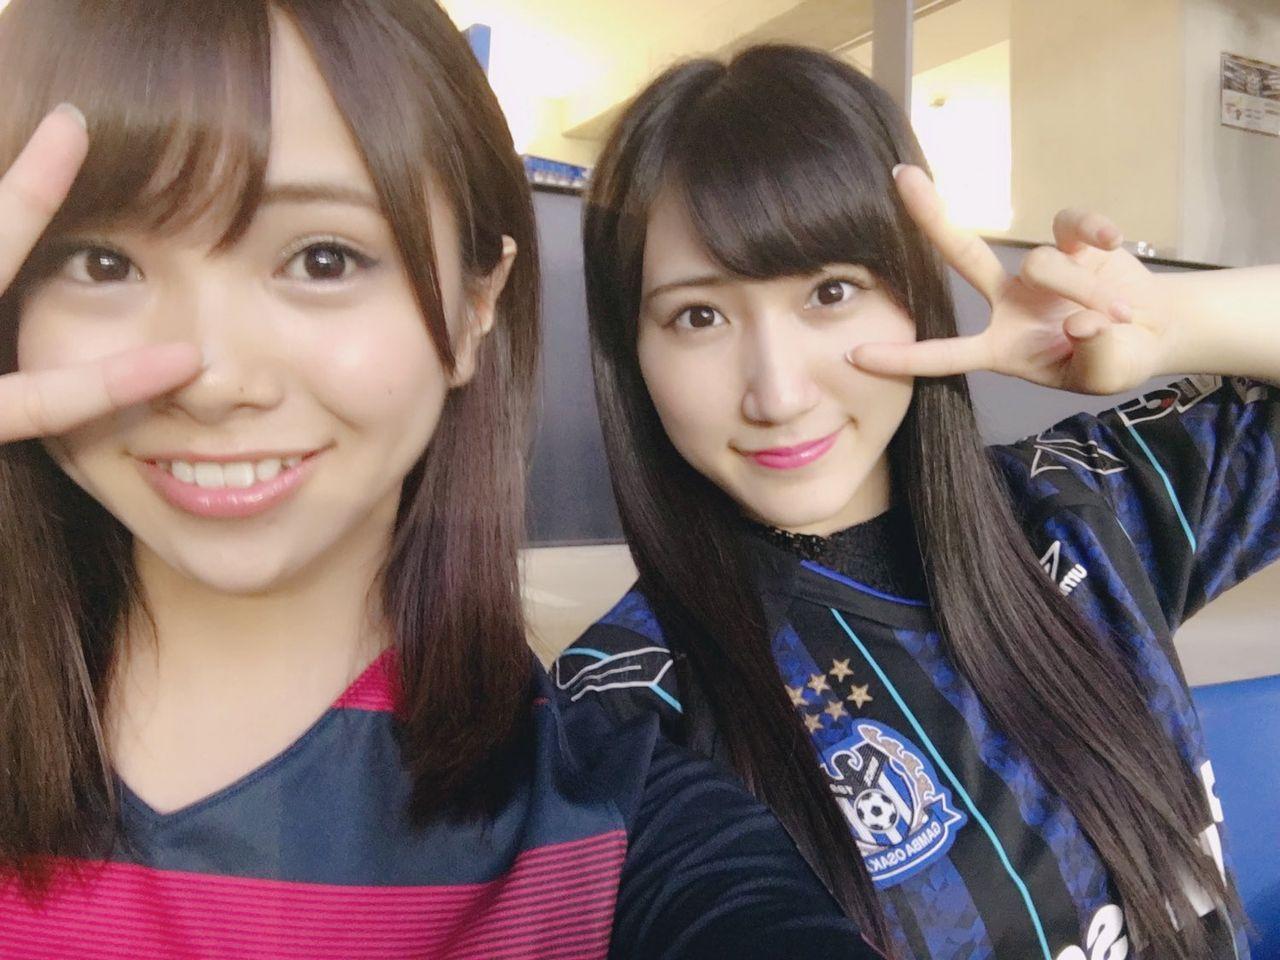 【NMB48】磯佳奈江(鹿島サポ)と西澤瑠莉奈(ガンバサポ)が一緒にサッカー観戦した結果・・・